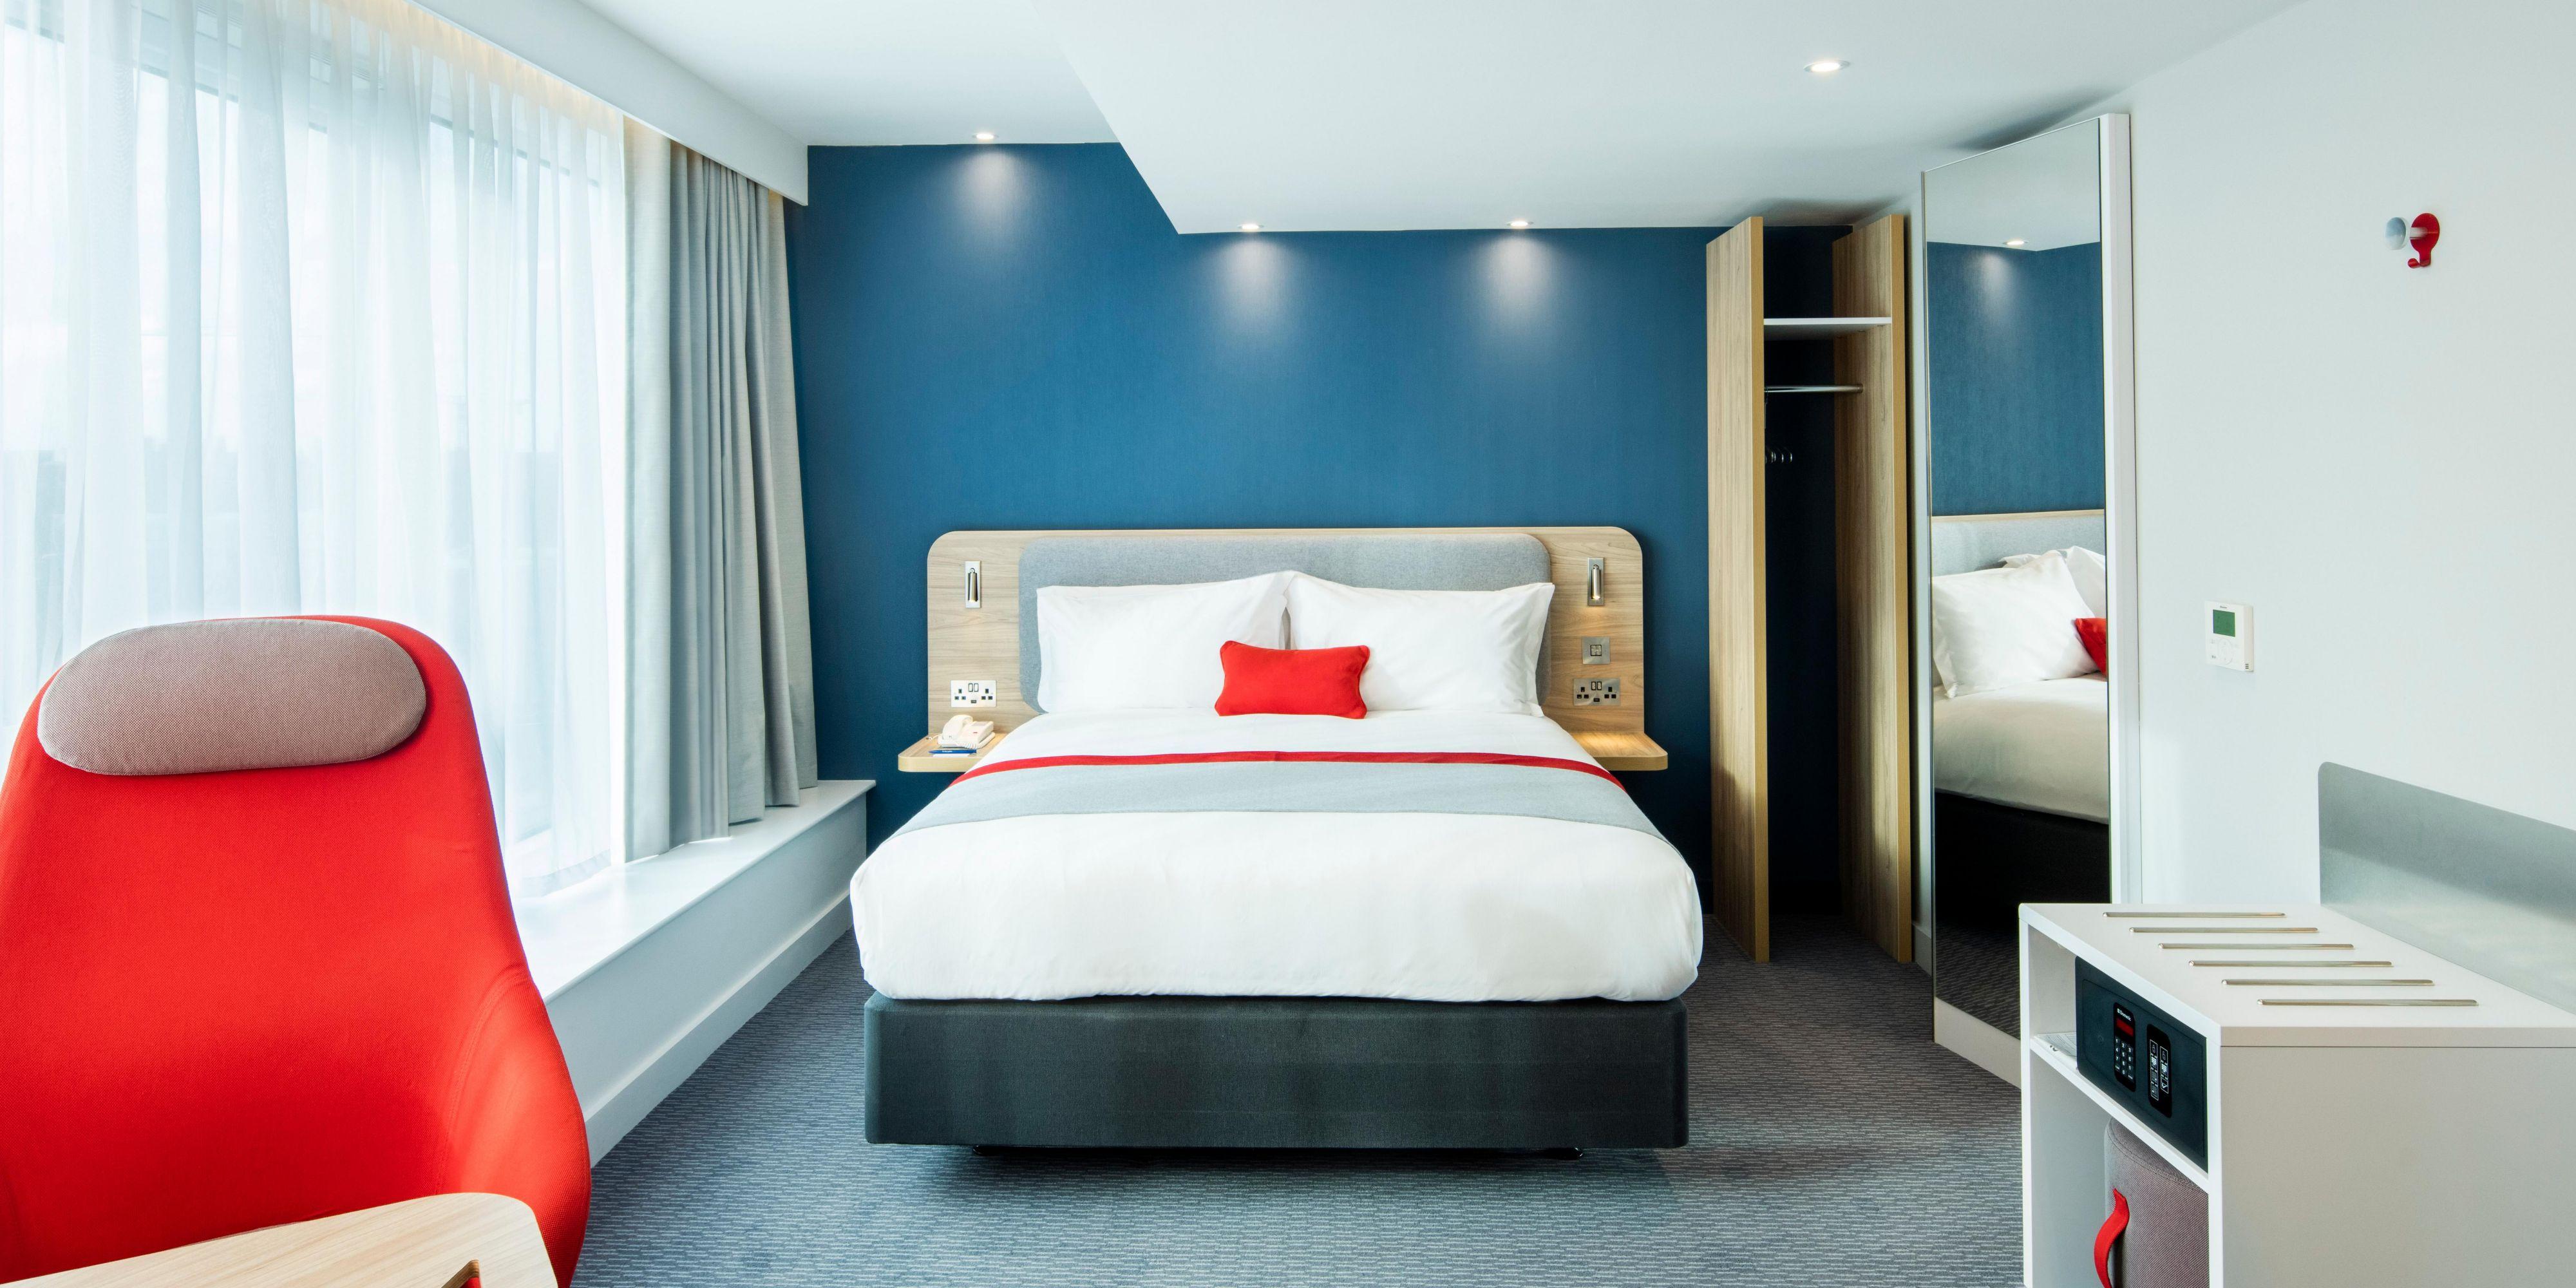 Holiday Inn Express Dublin 4733329280 2x1